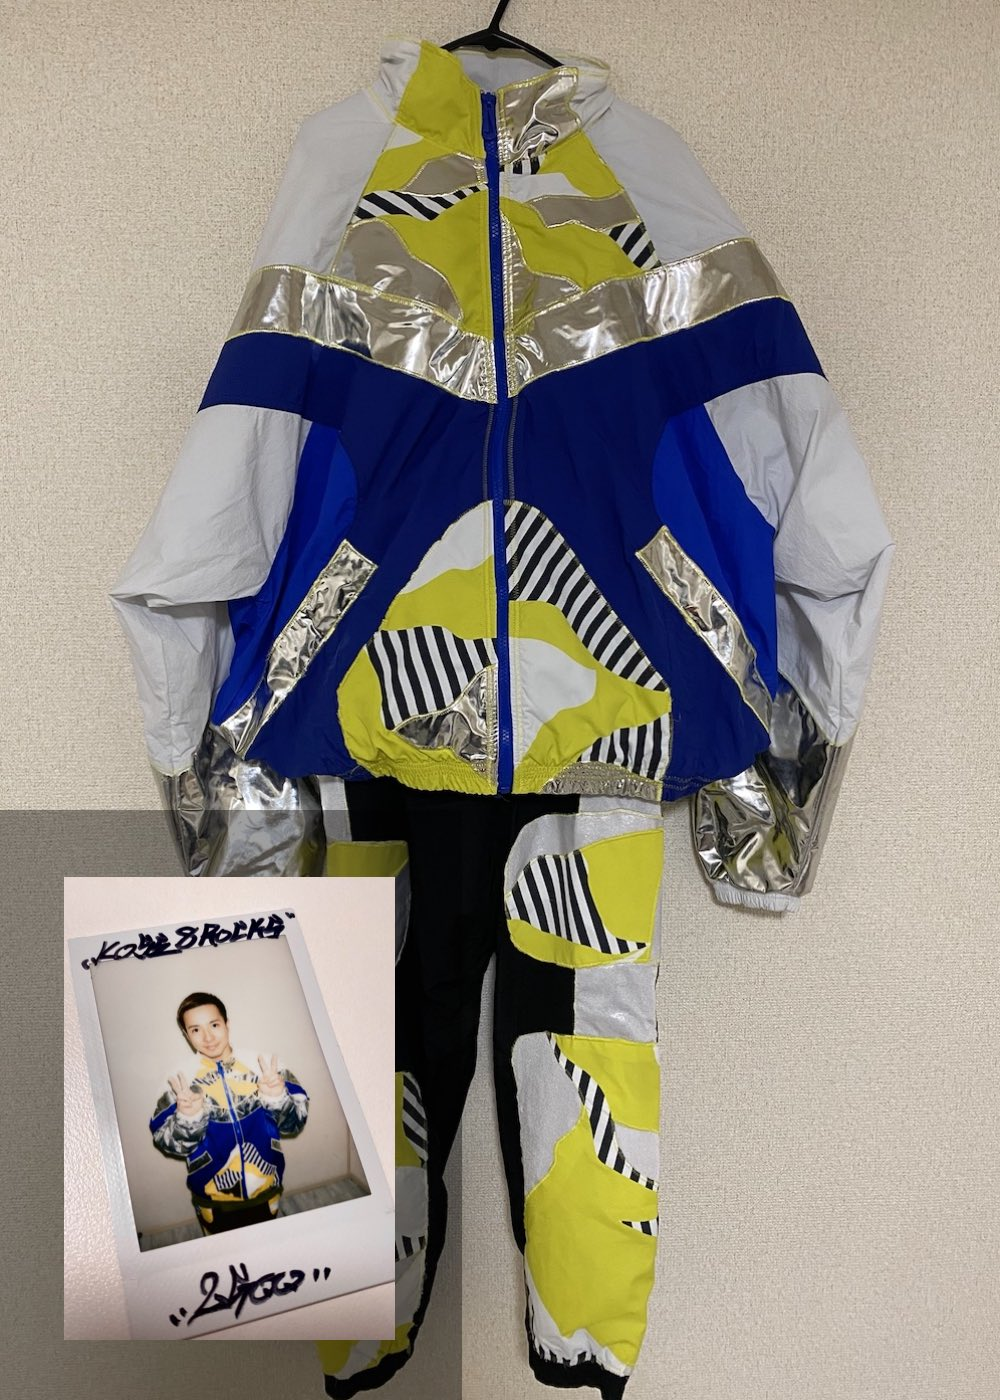 【2GOO】「Semi Final 2nd Match 衣装(上下)+サイン入りチェキ」